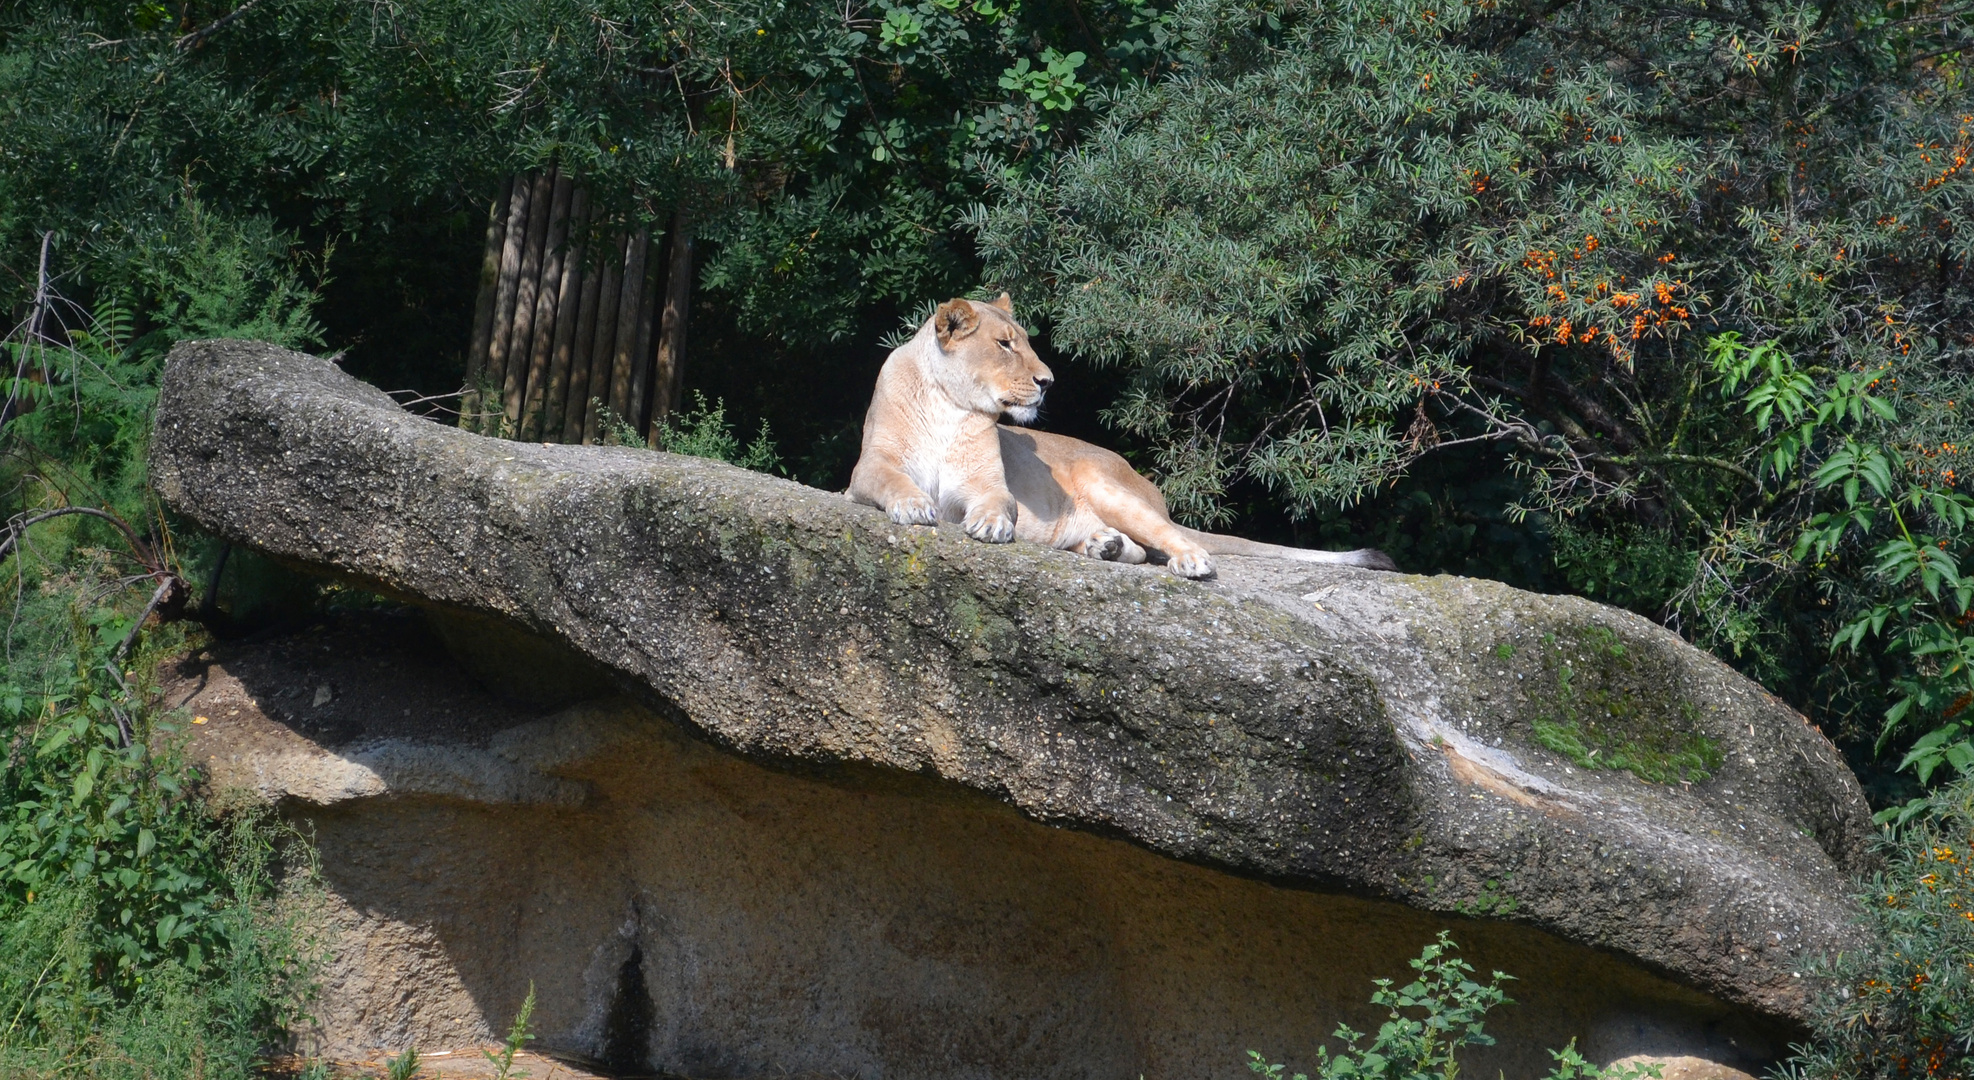 Kalahari-Löwe im Zoo Basel